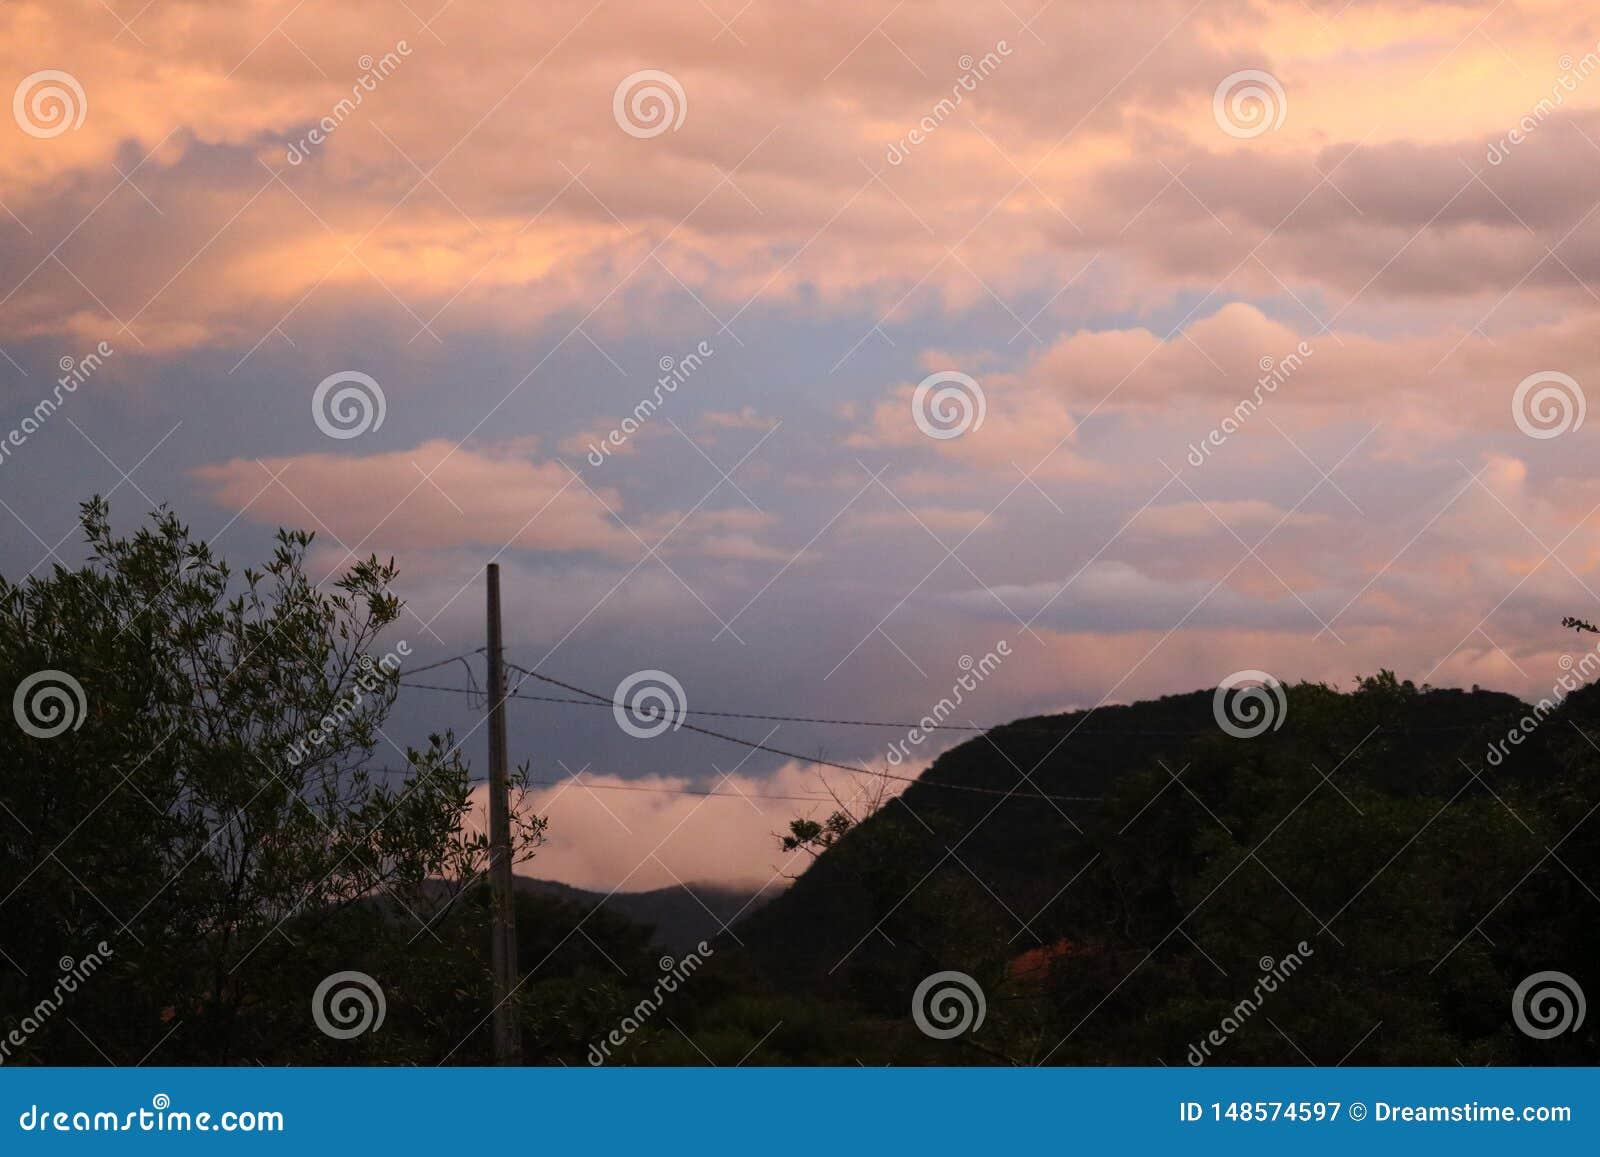 Clouds on mountain city sunset beach